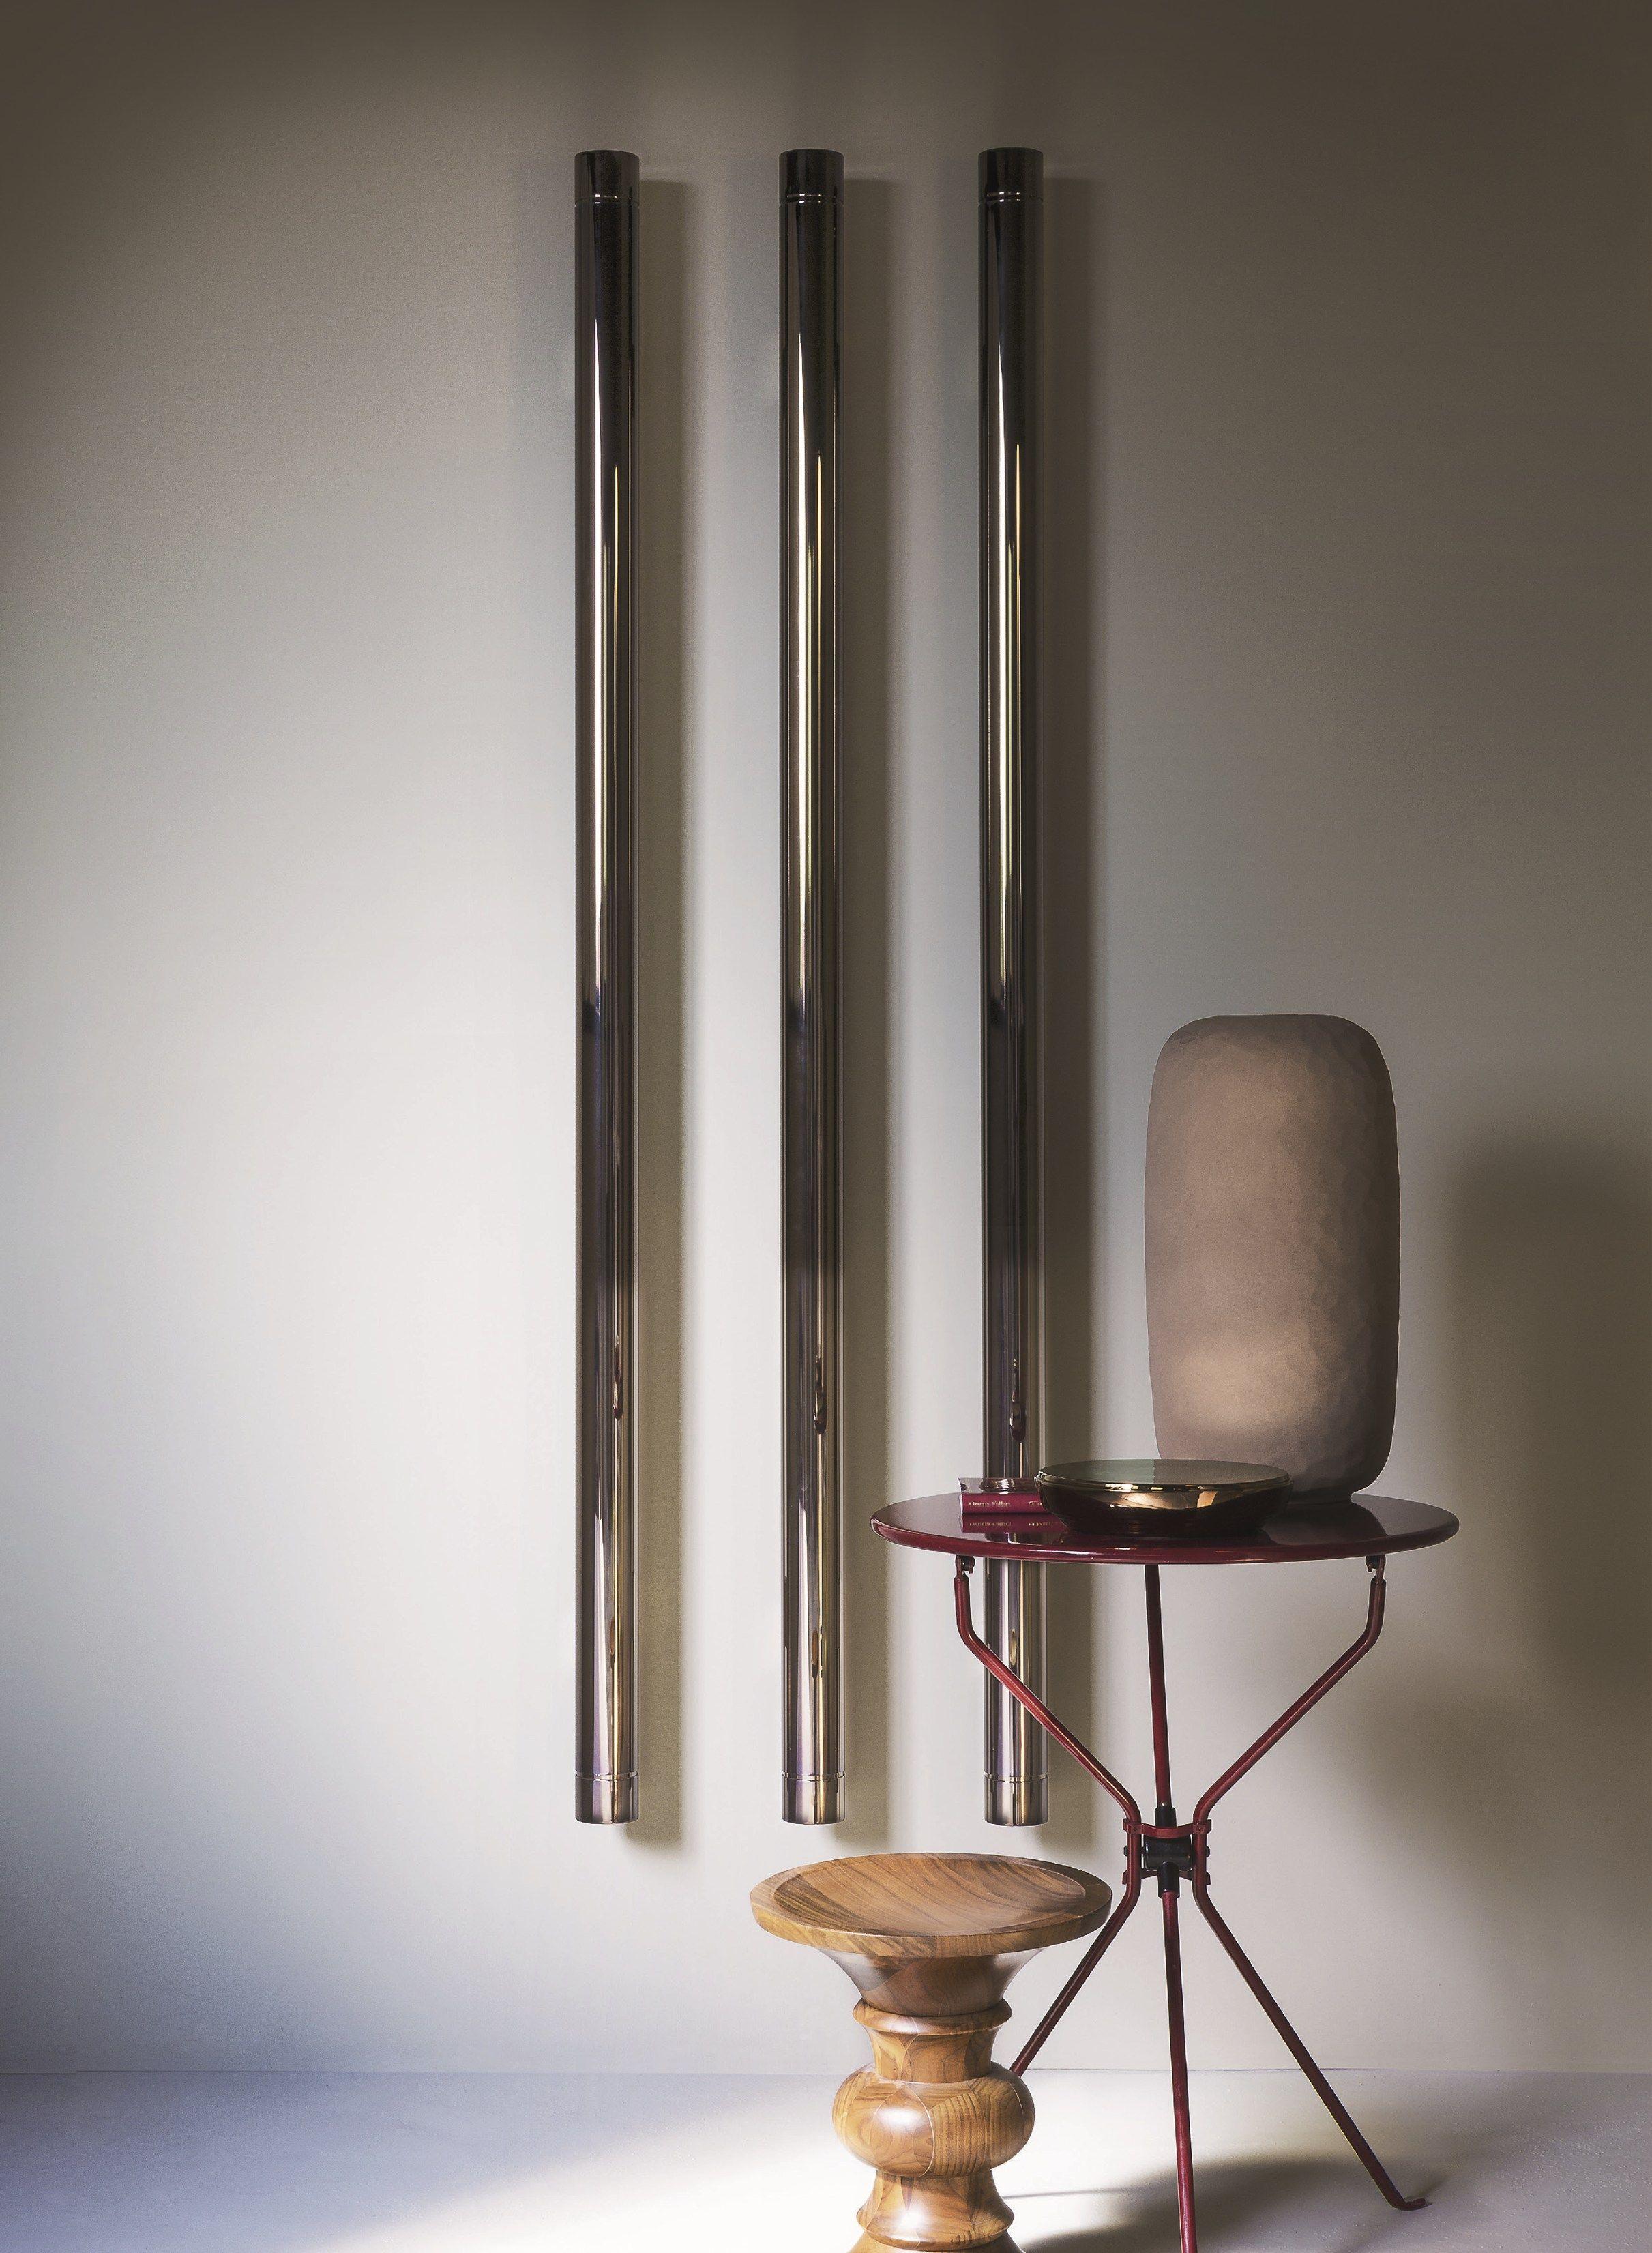 T b t vertical decorative radiator by tubes radiatori for Termoarredo salone